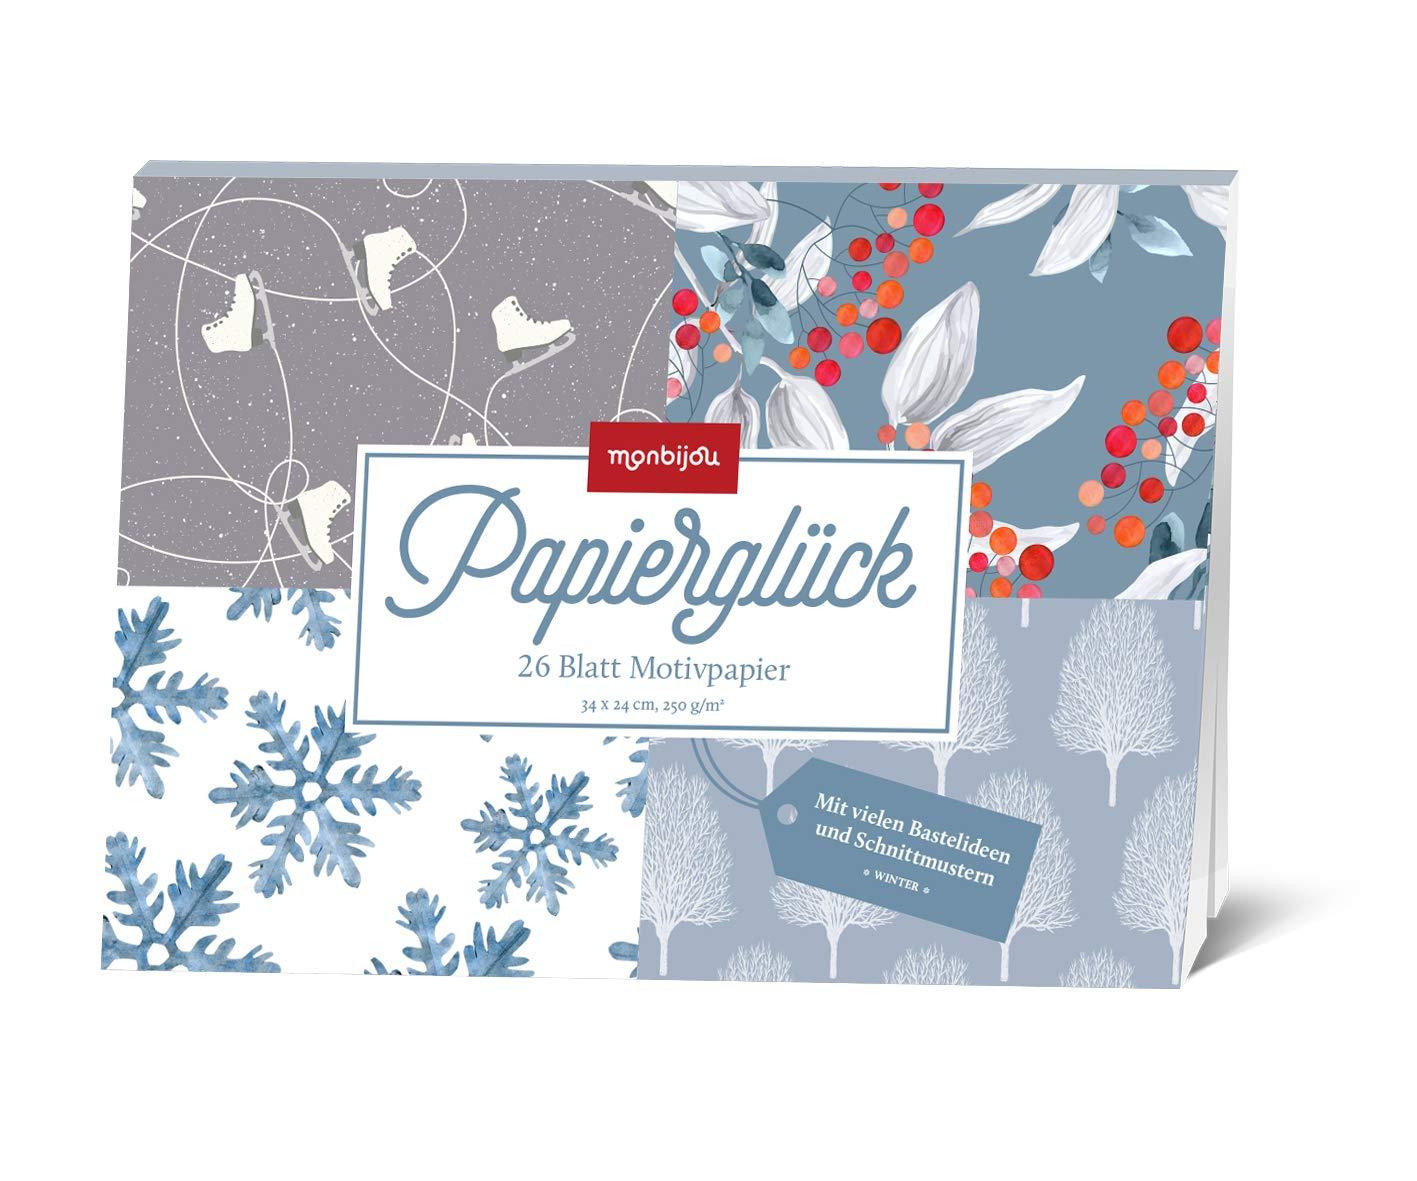 Papierglück - Design Winter: Motivpapier (monbijou)